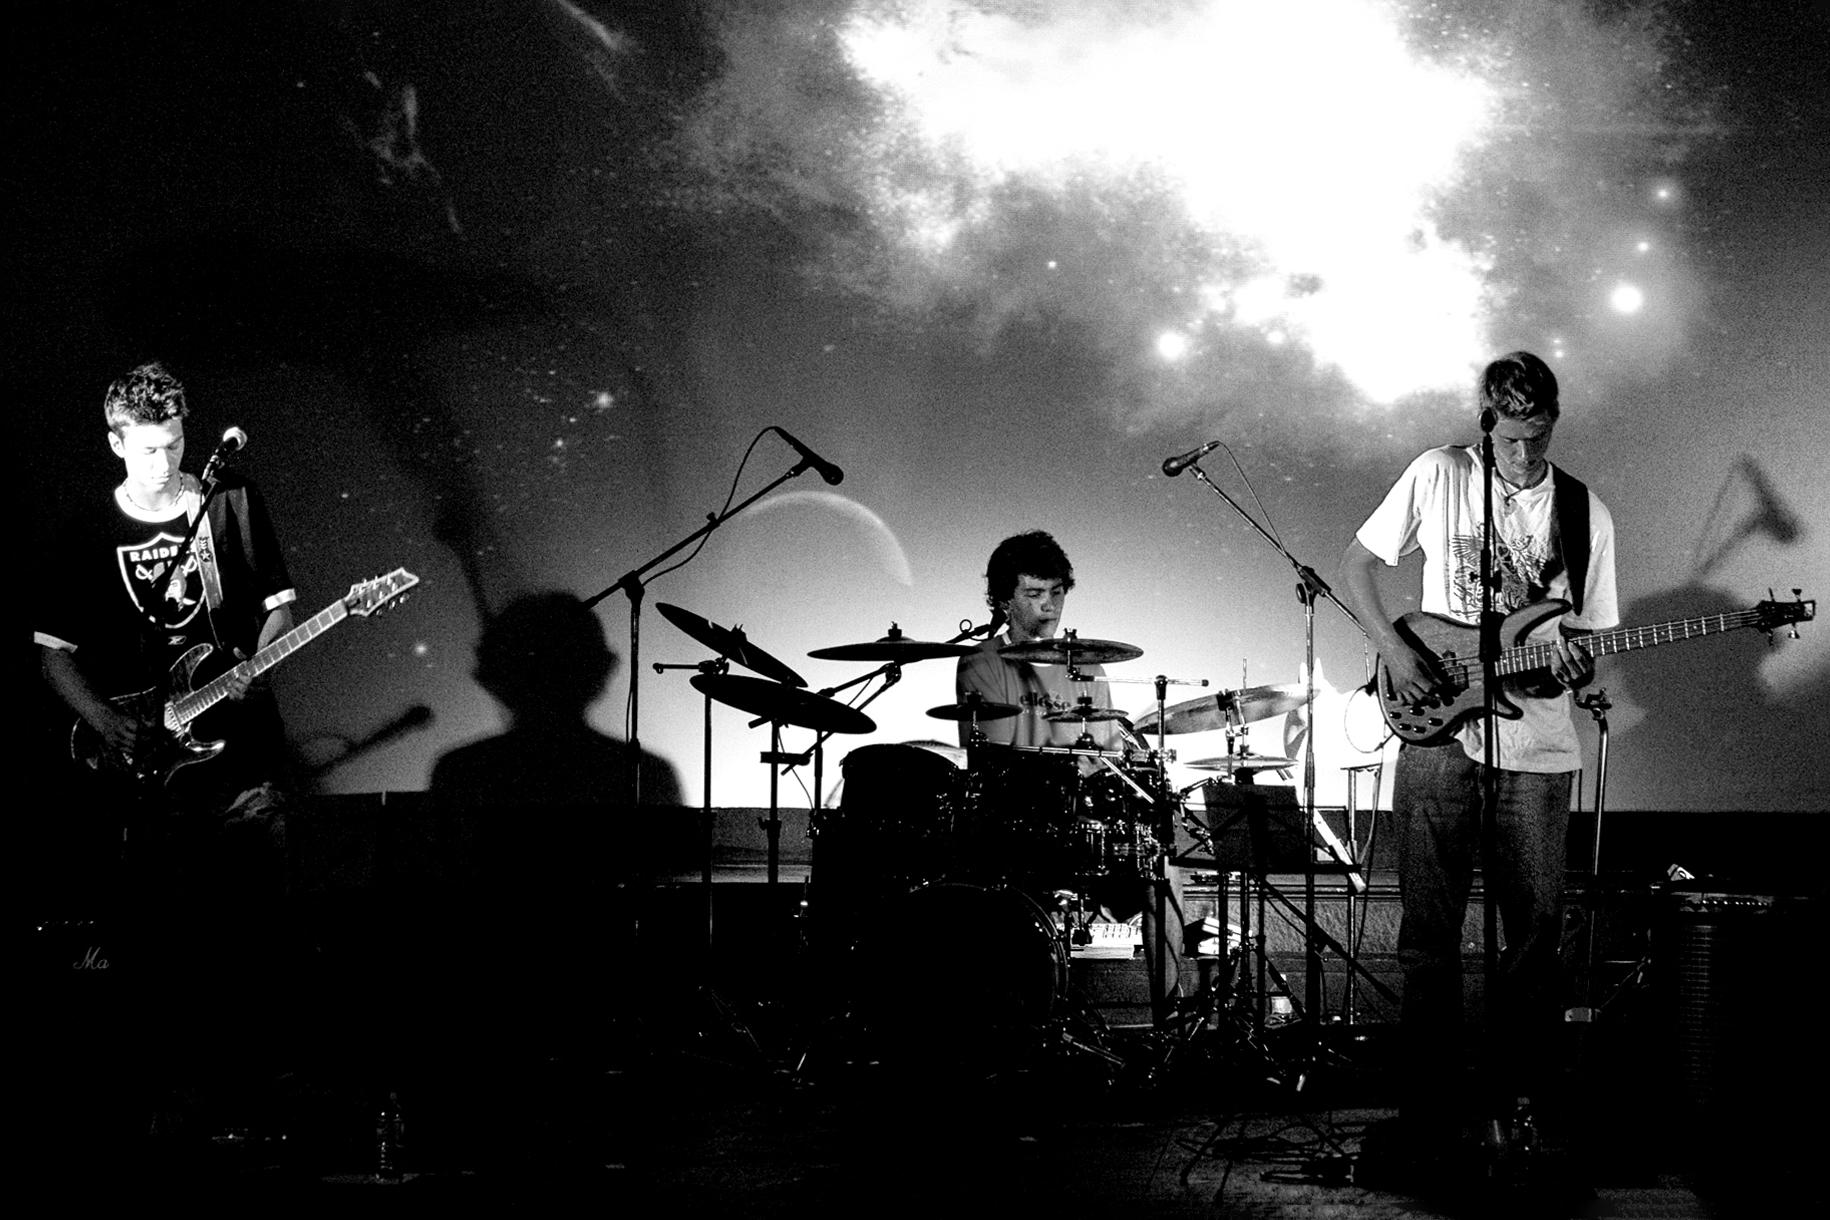 Hoist live at The Park Theatre in Winnipeg c. 2006 – photo by JT Austin